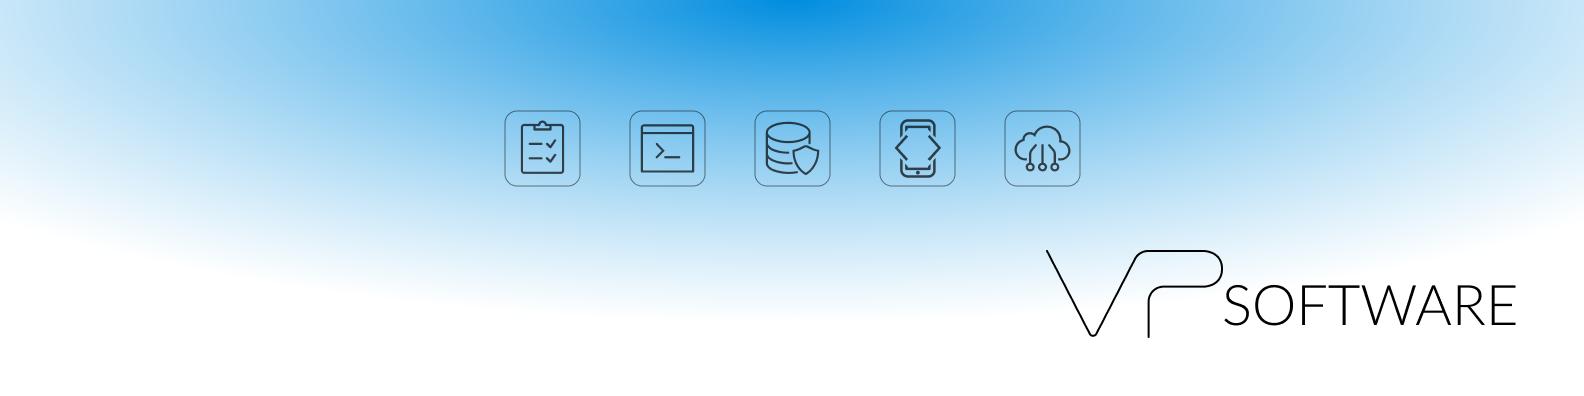 VP Software LLC Web Design (UI/UX) Ukraine